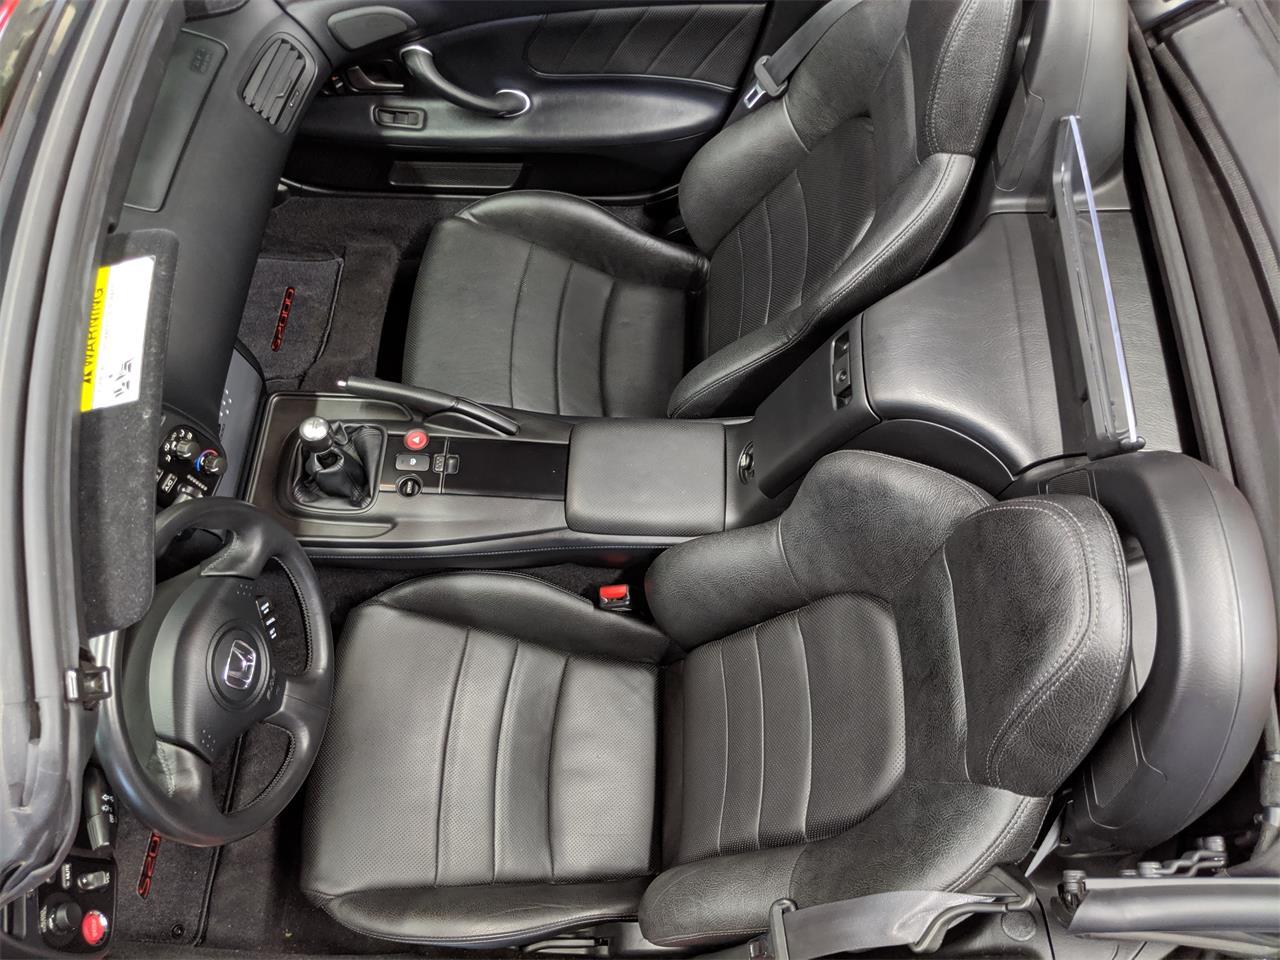 2007 Honda S2000 (CC-1417400) for sale in OSPREY, Florida